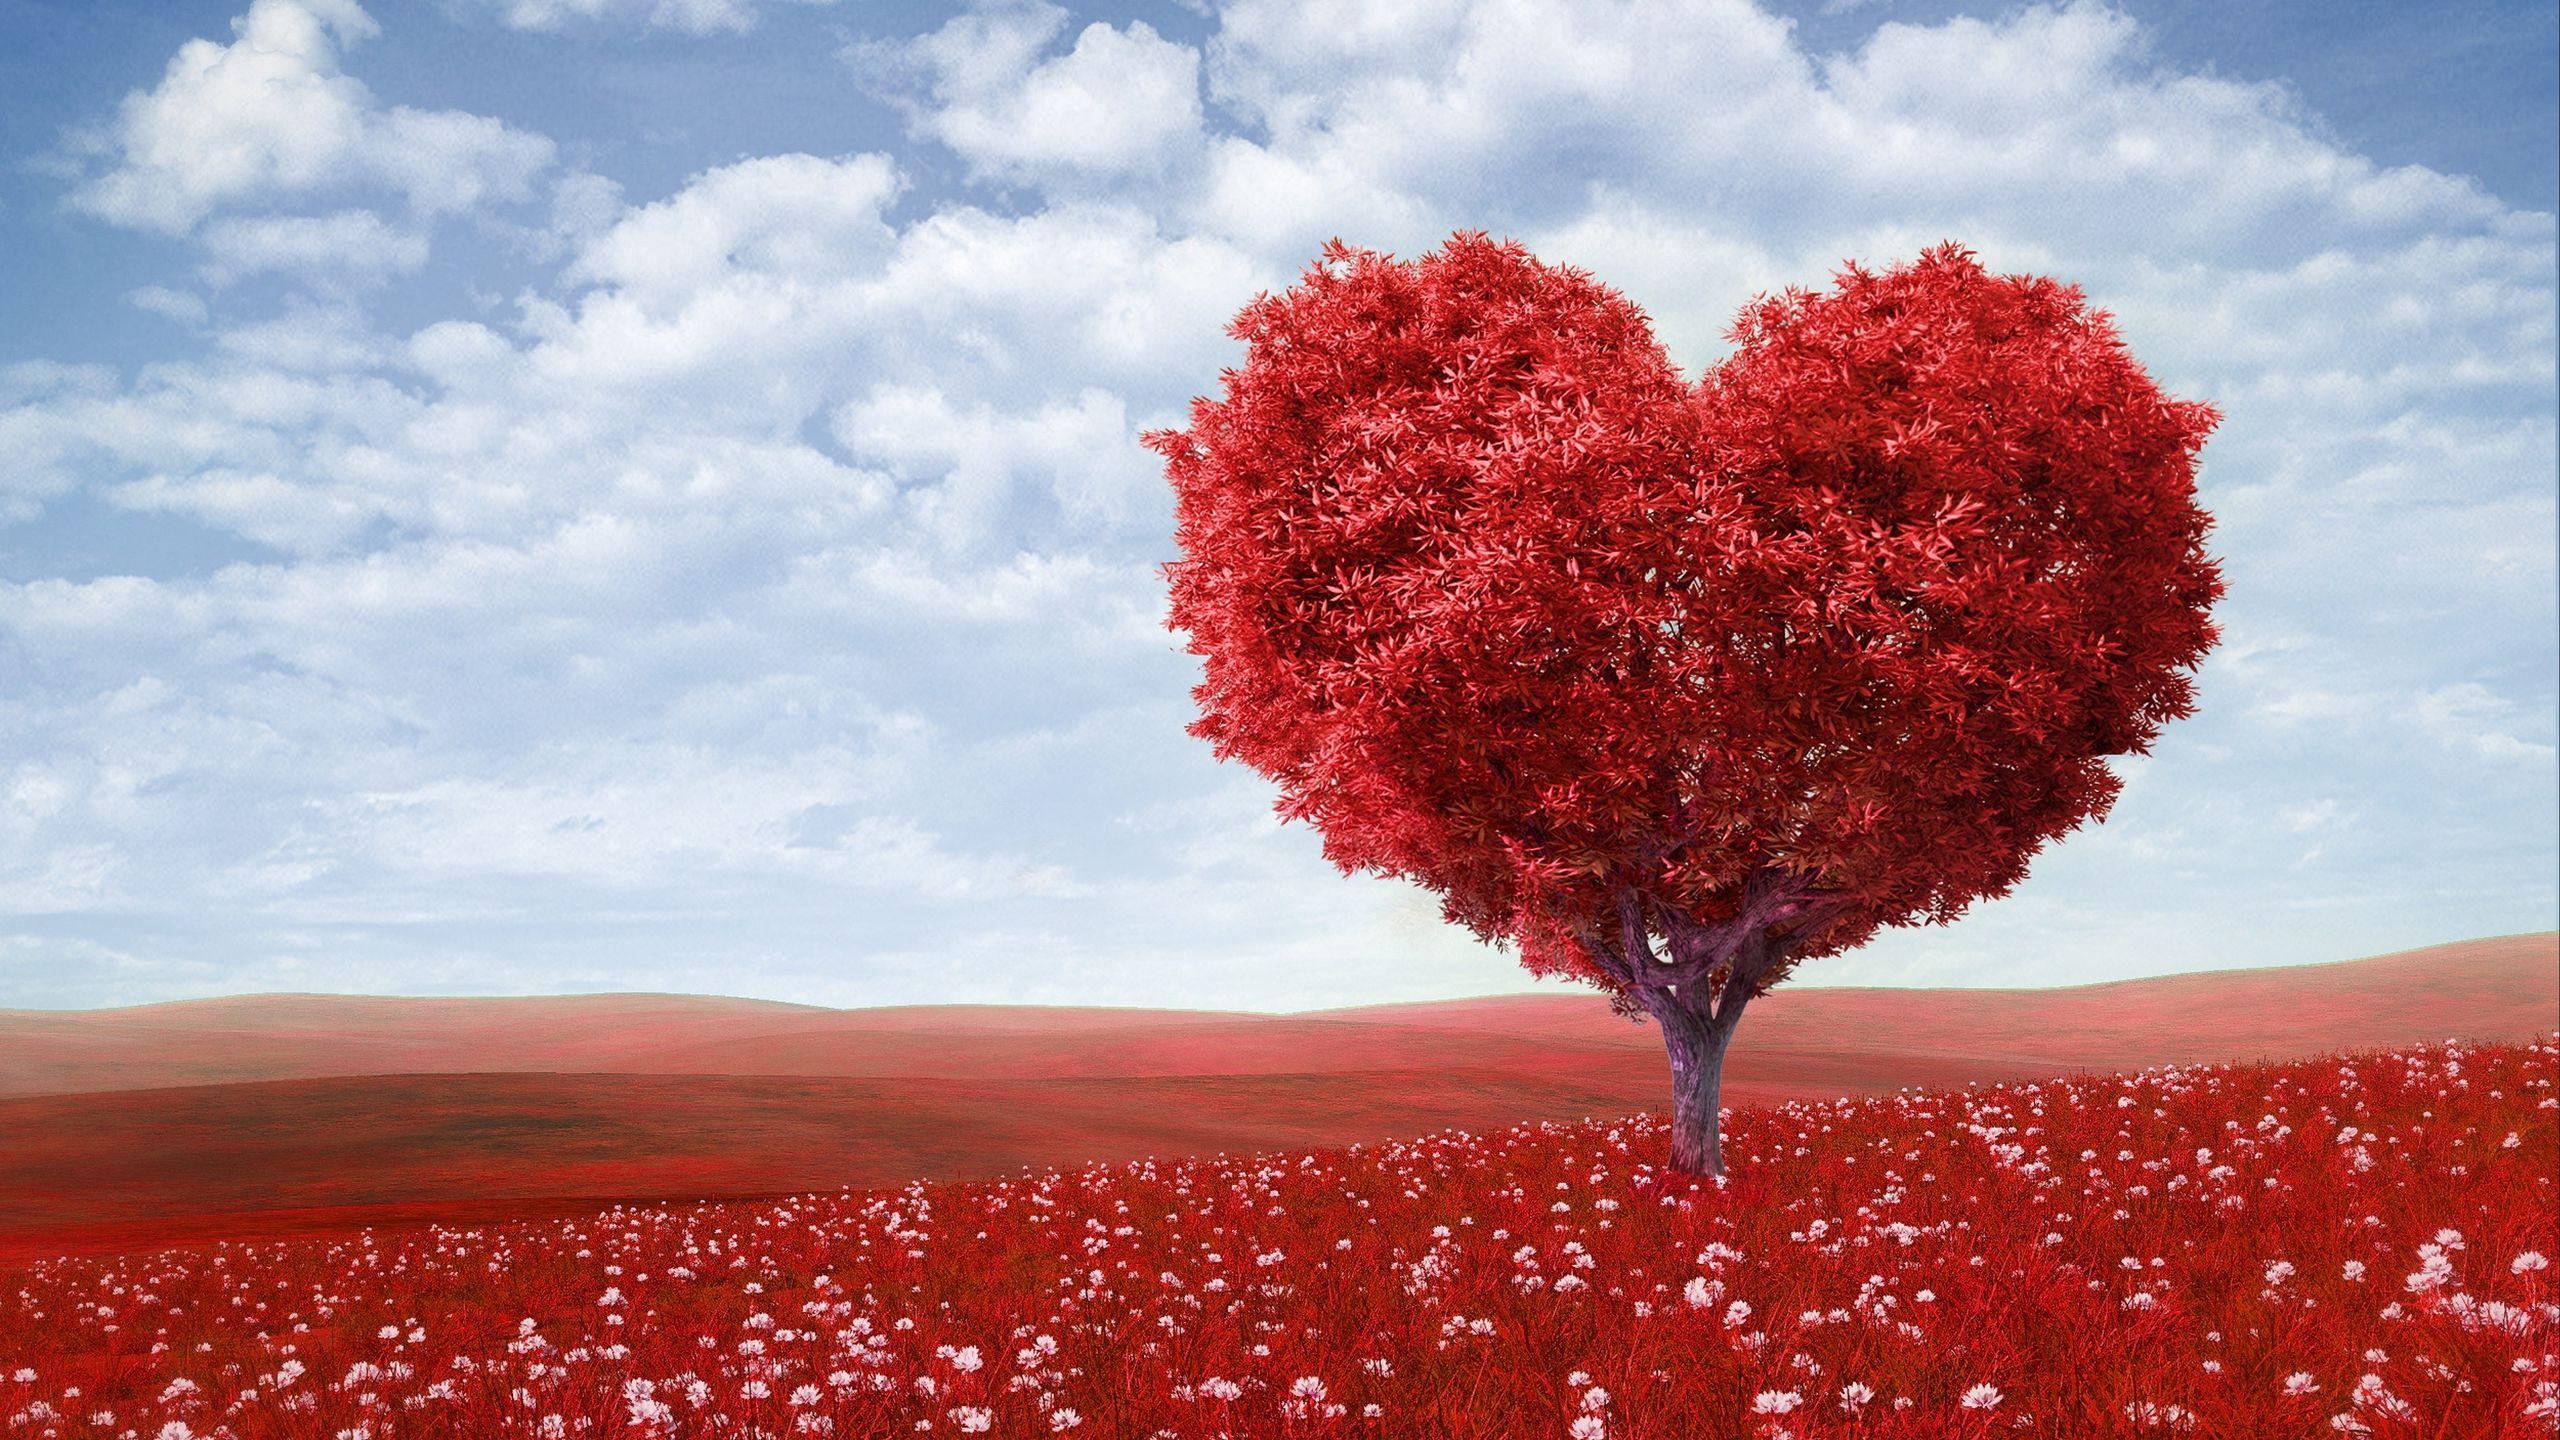 2560x1440 Wallpaper tree, heart, photoshop, field, grass, romance